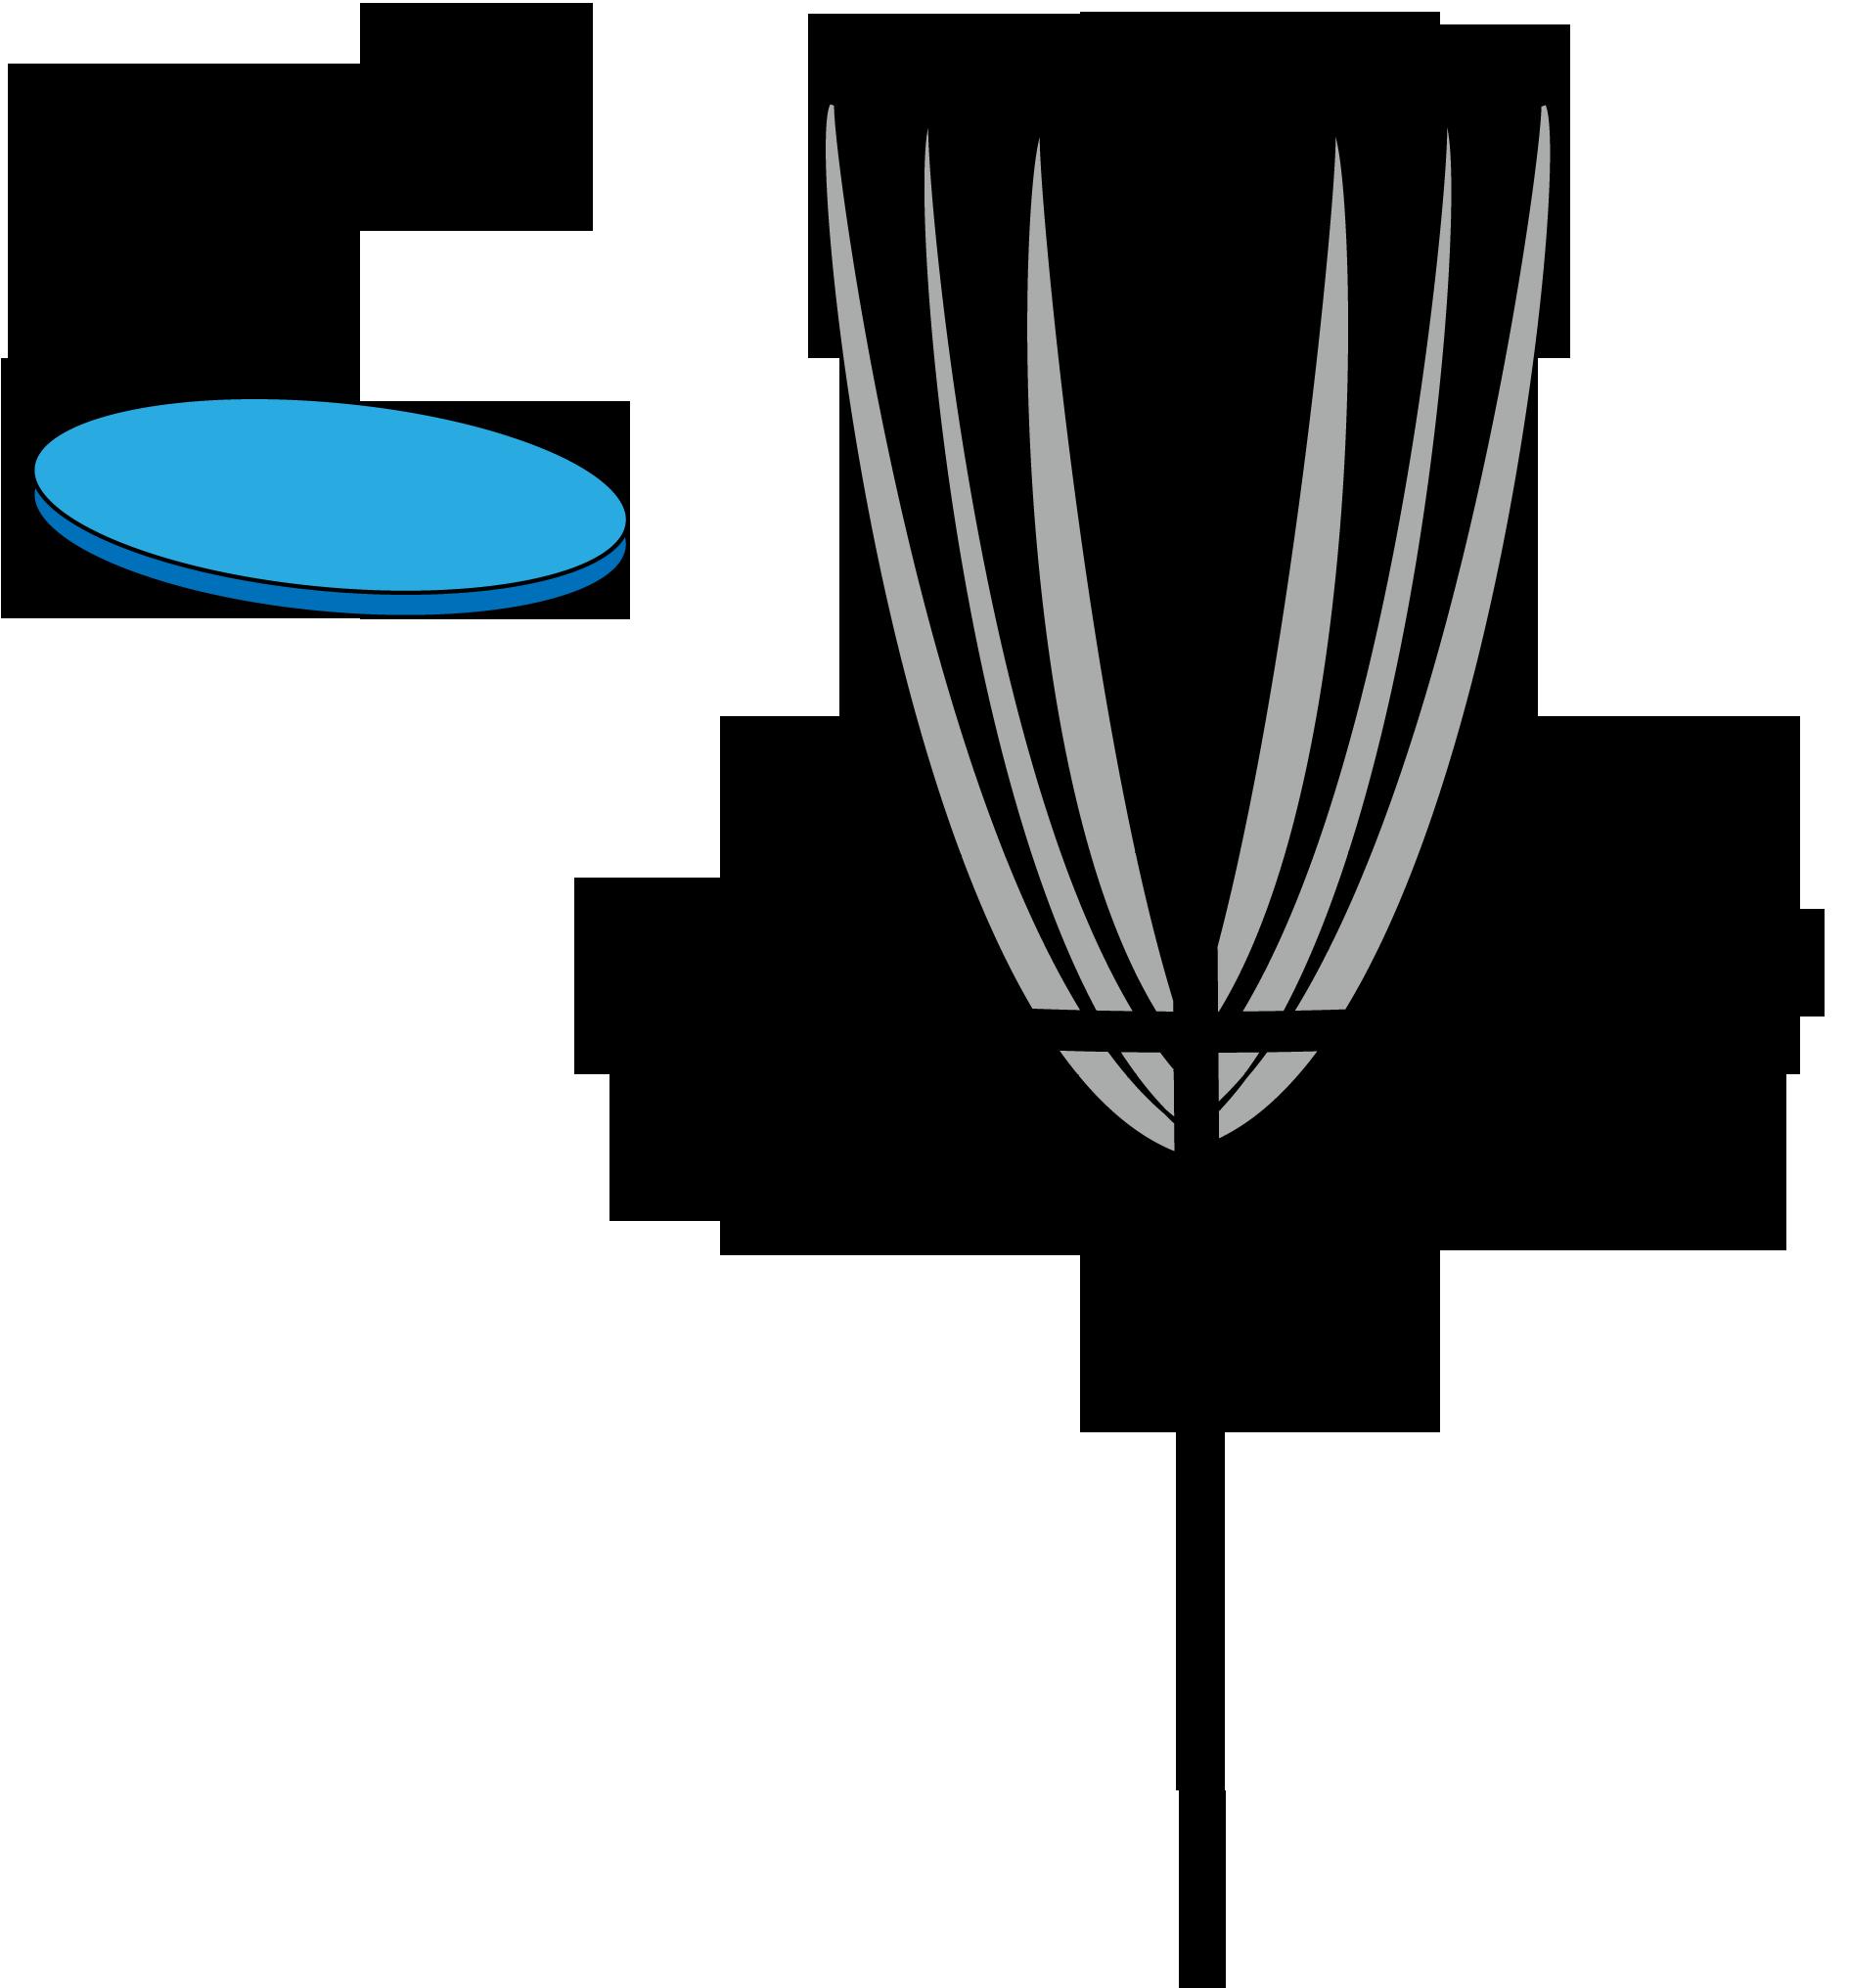 Frisbee Golf Clipart.